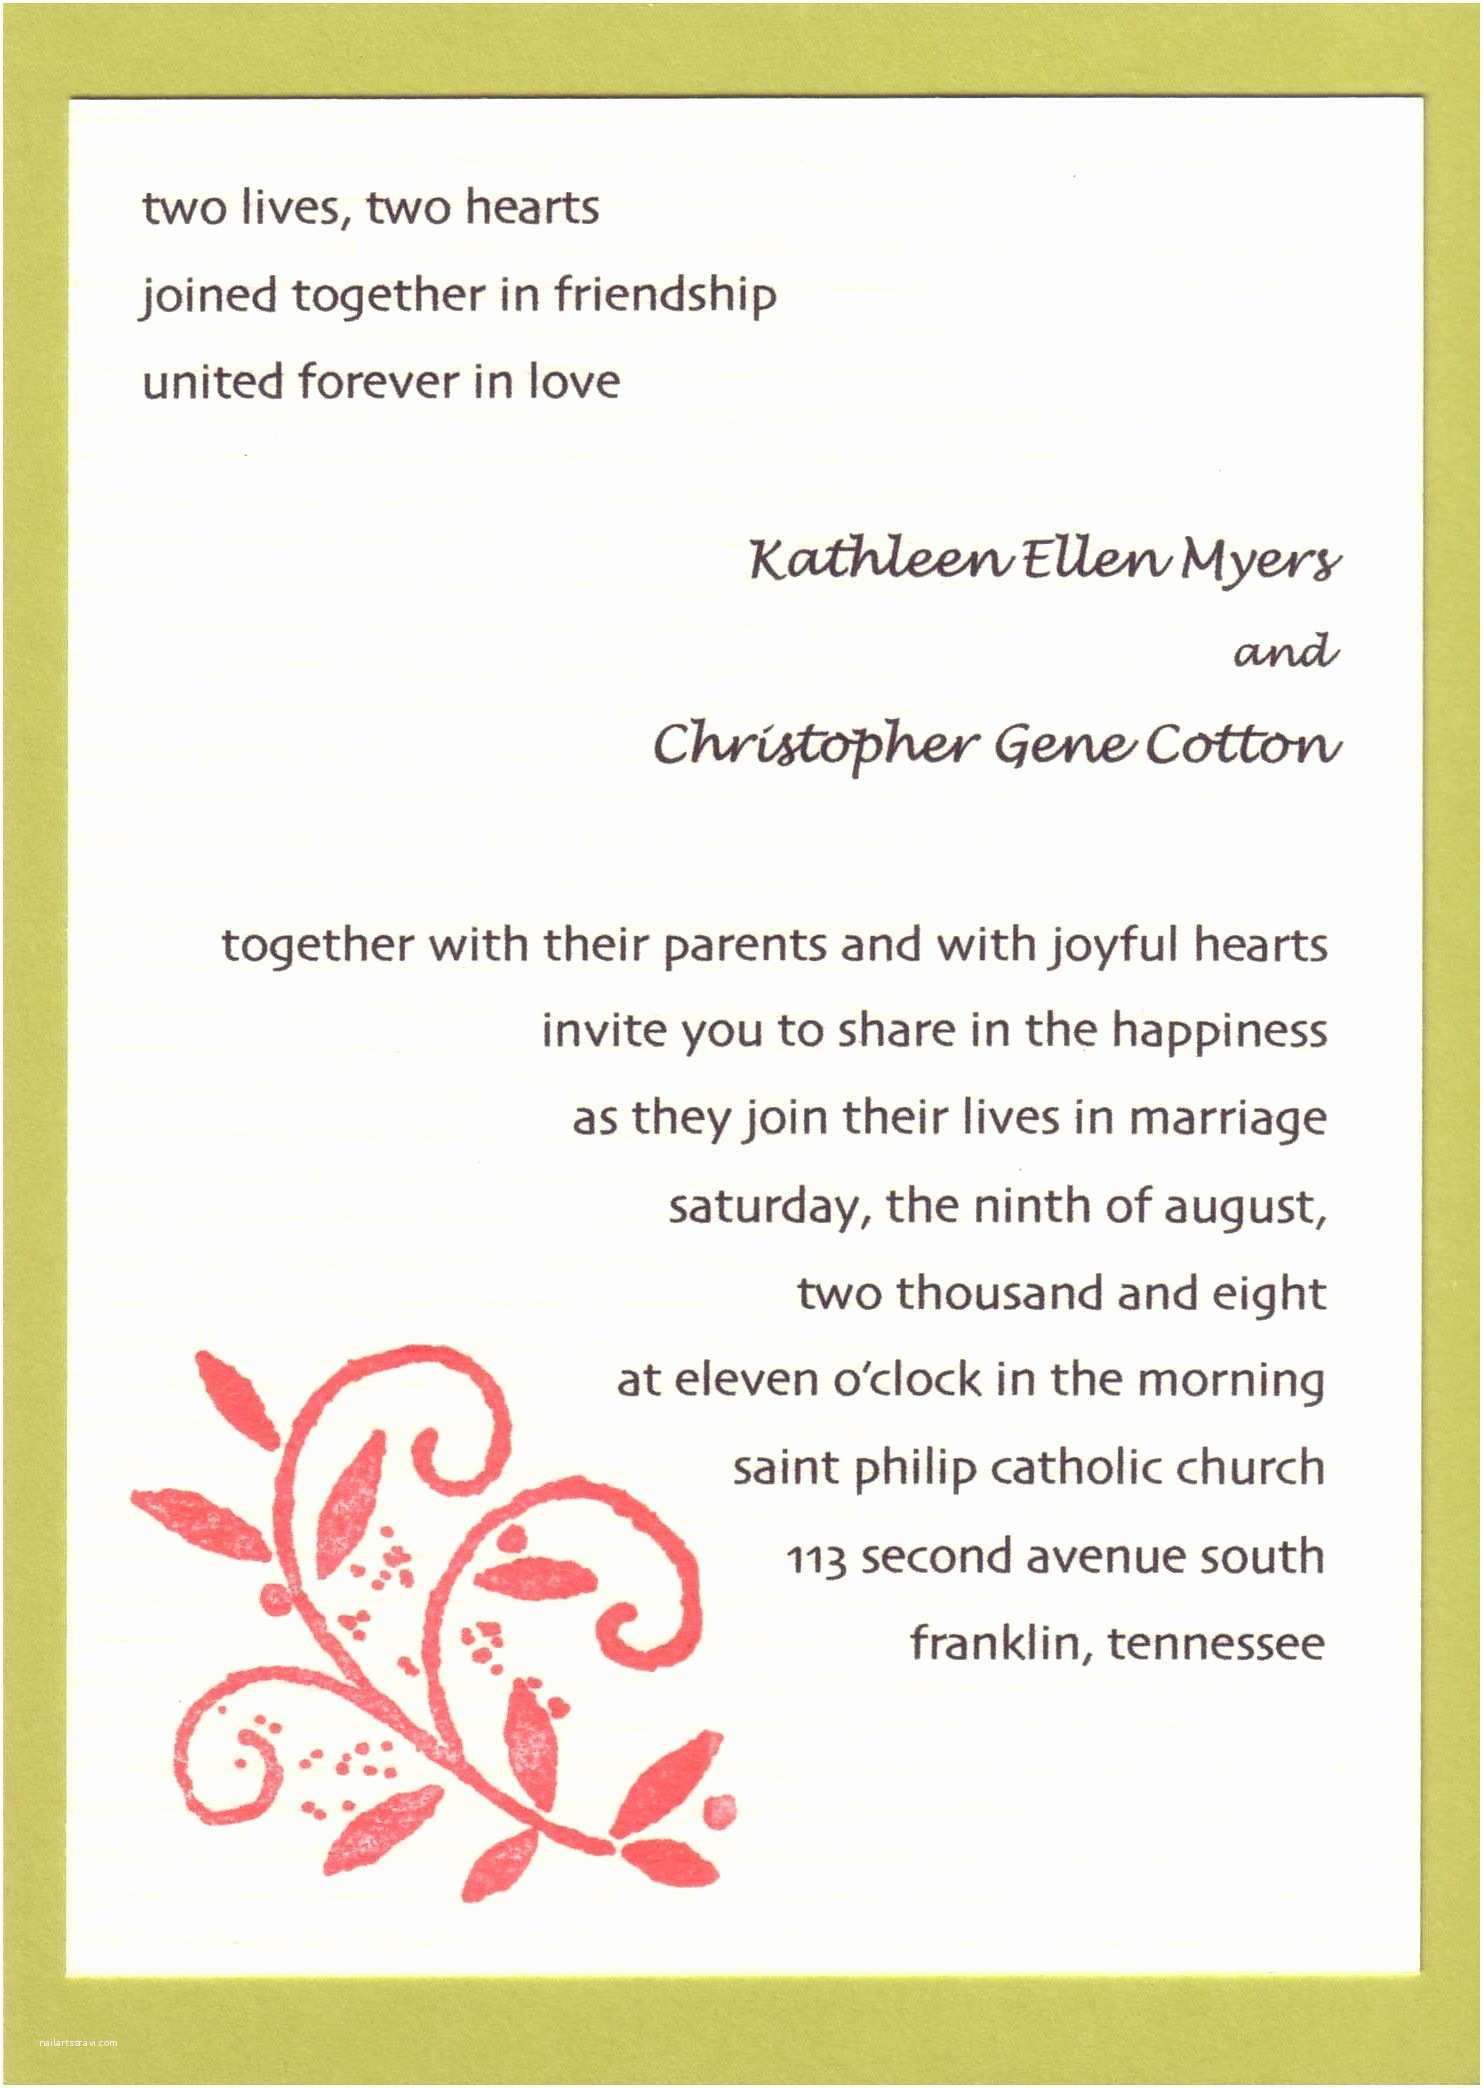 Wedding Invitation Poems Wedding Invitations Cards Wording Wedding Invitation